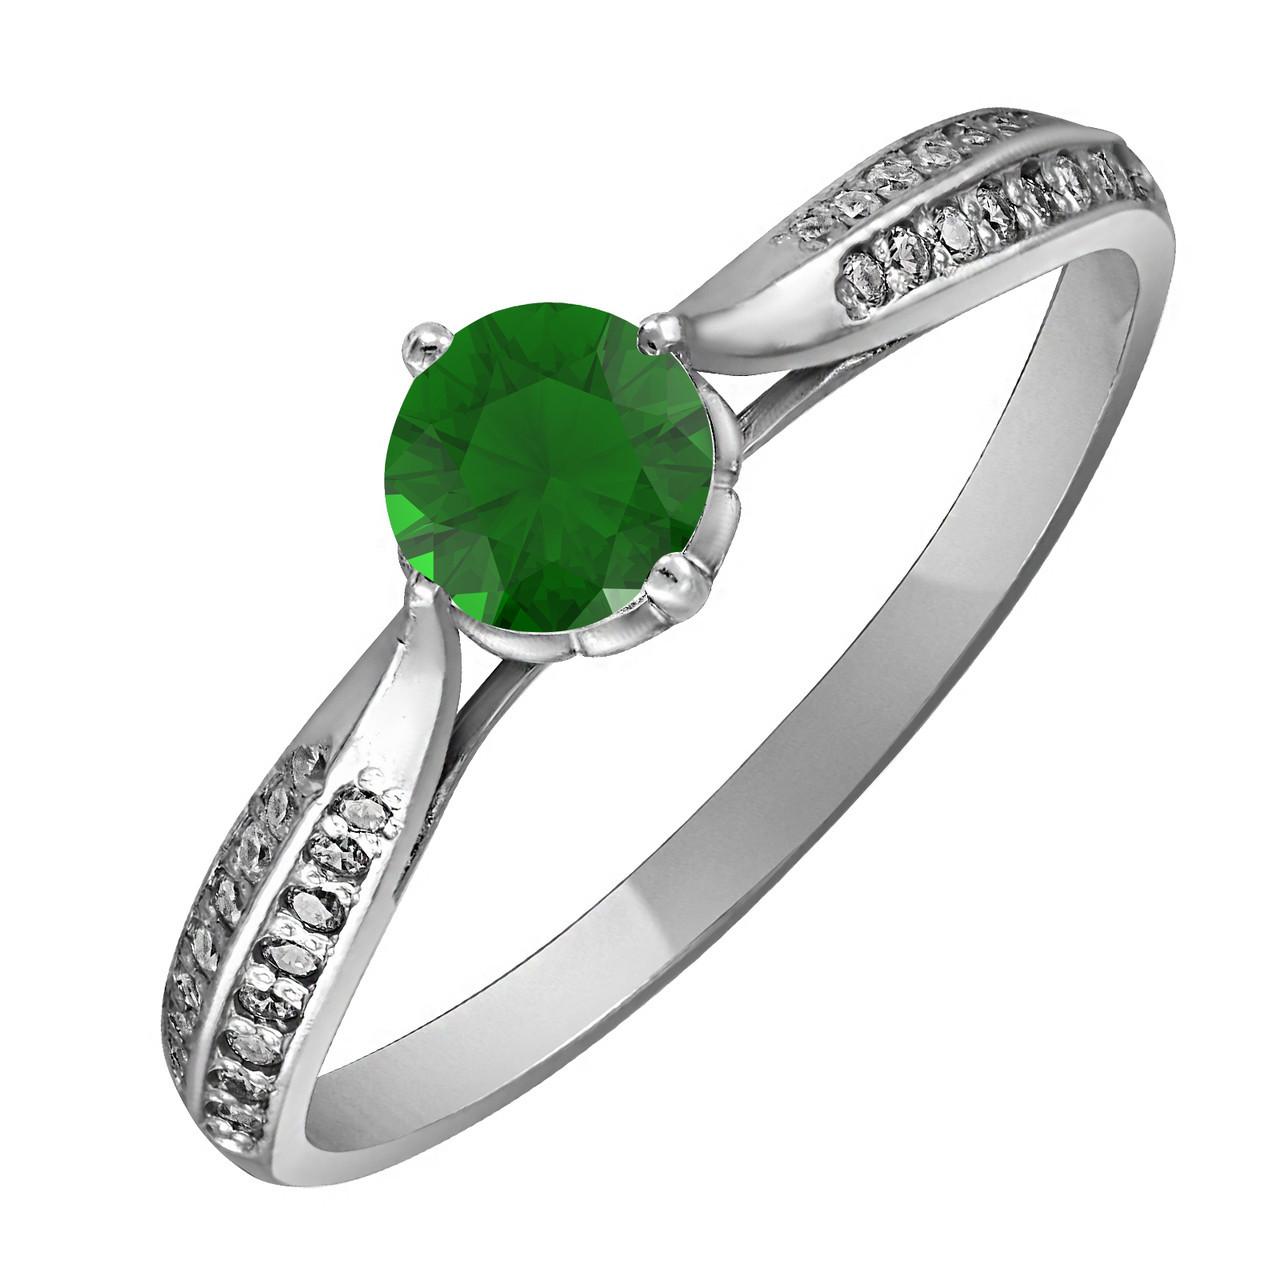 Кольцо из серебра с зелёным кубическим цирконием Twiddle Jewelry 18.0 размер (К007з-18.0)